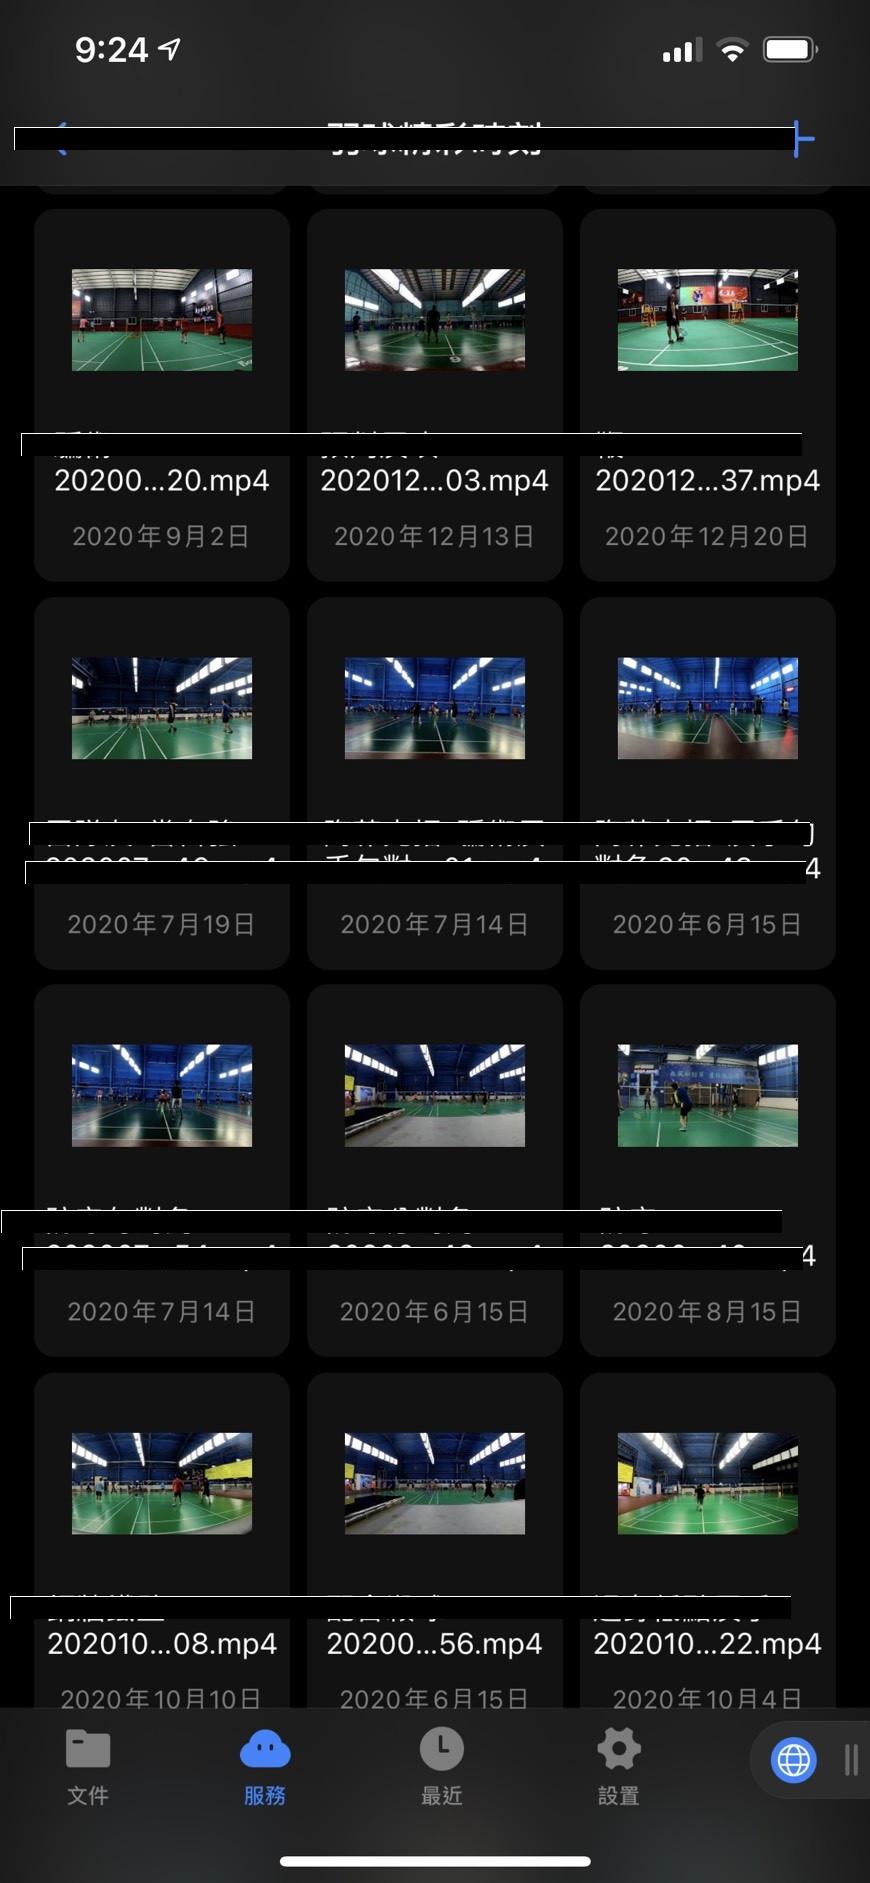 https://ithelp.ithome.com.tw/upload/images/20210114/20134314eZQrPFlChp.jpg